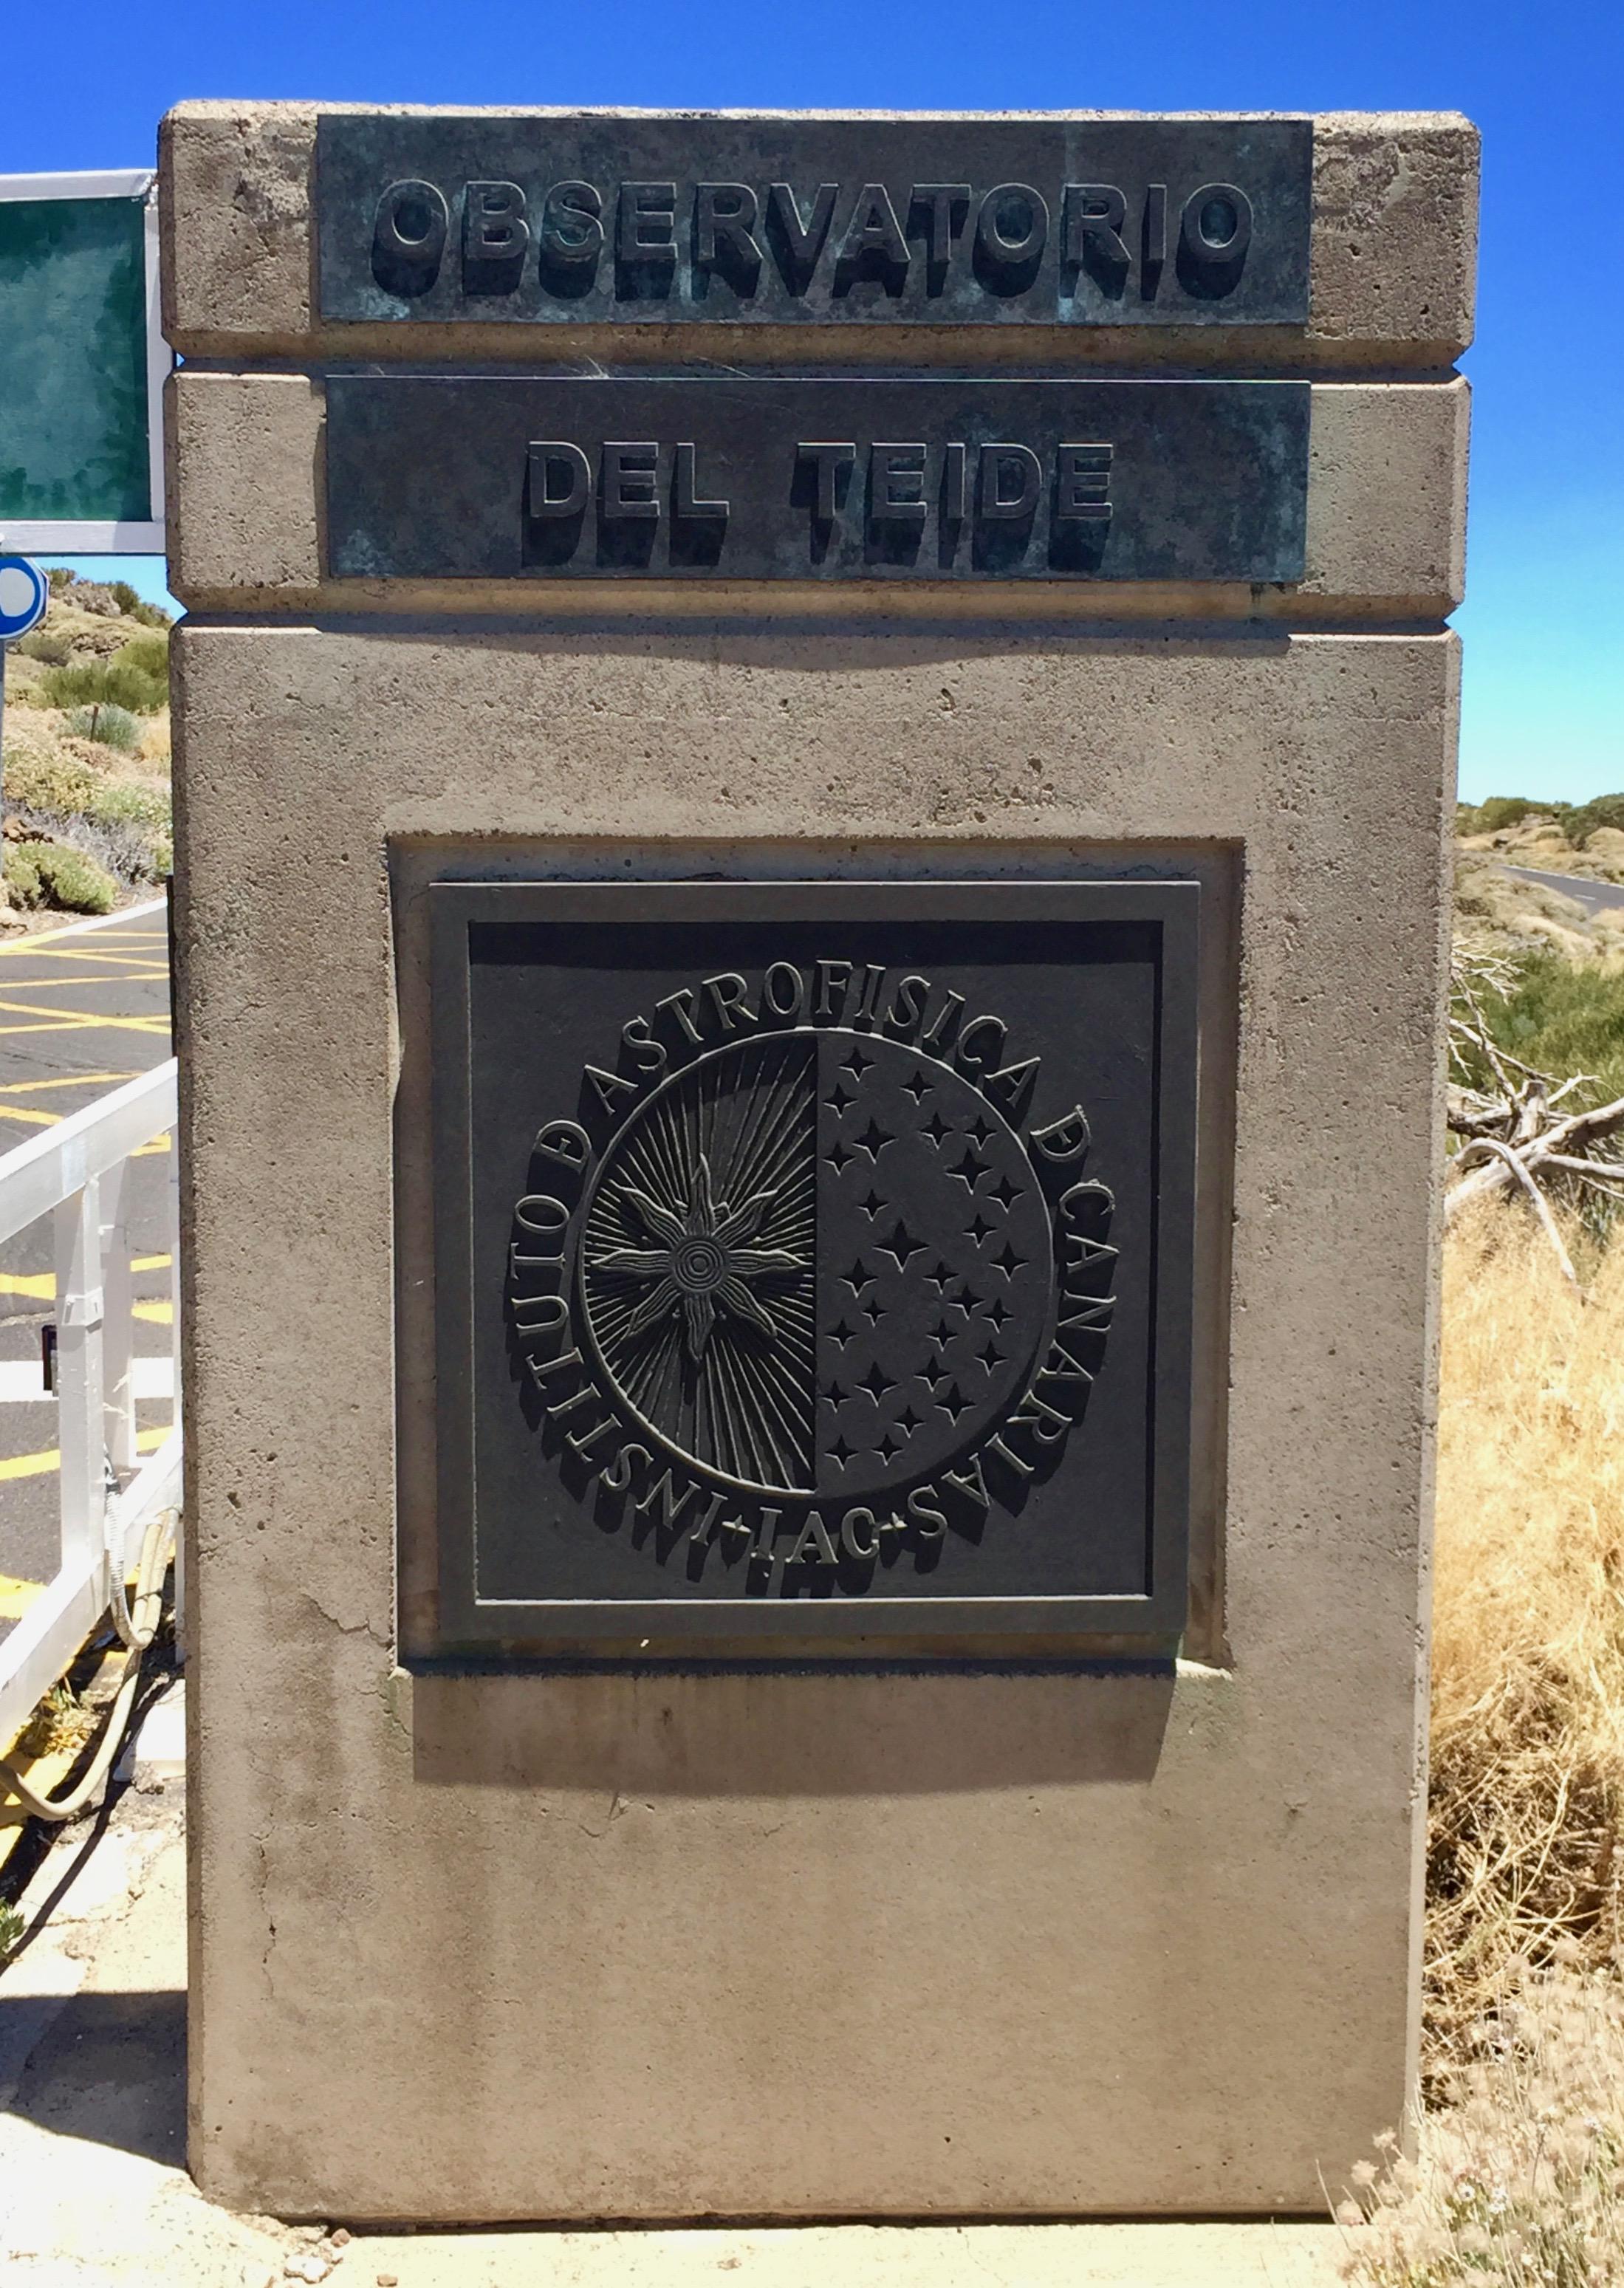 Begrüßung am Eingang des Teide Observatoriums.